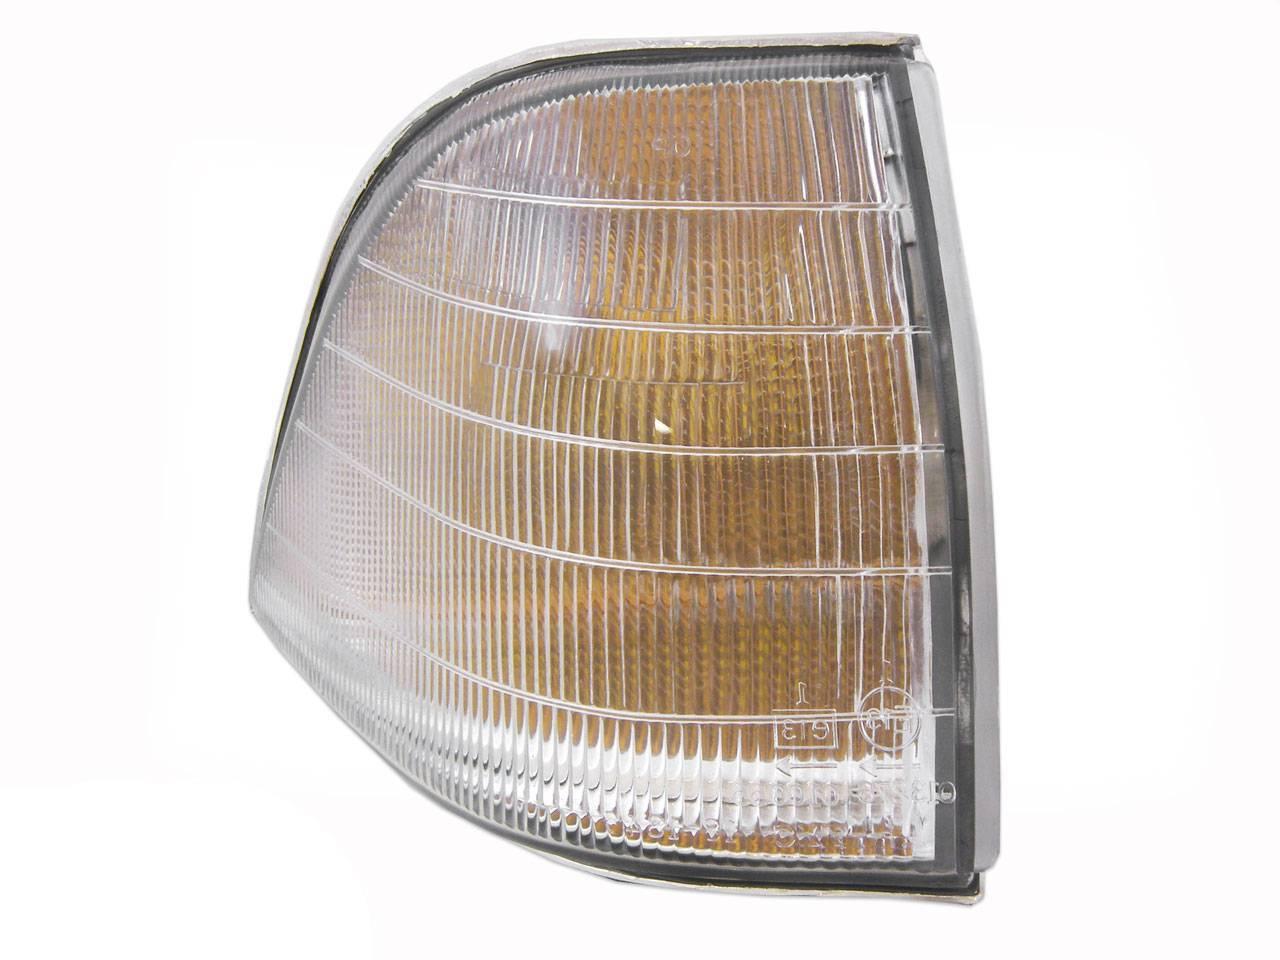 hight resolution of holden vl commodore rhs indicator corner light lamp 86 87 88 berlina calais new